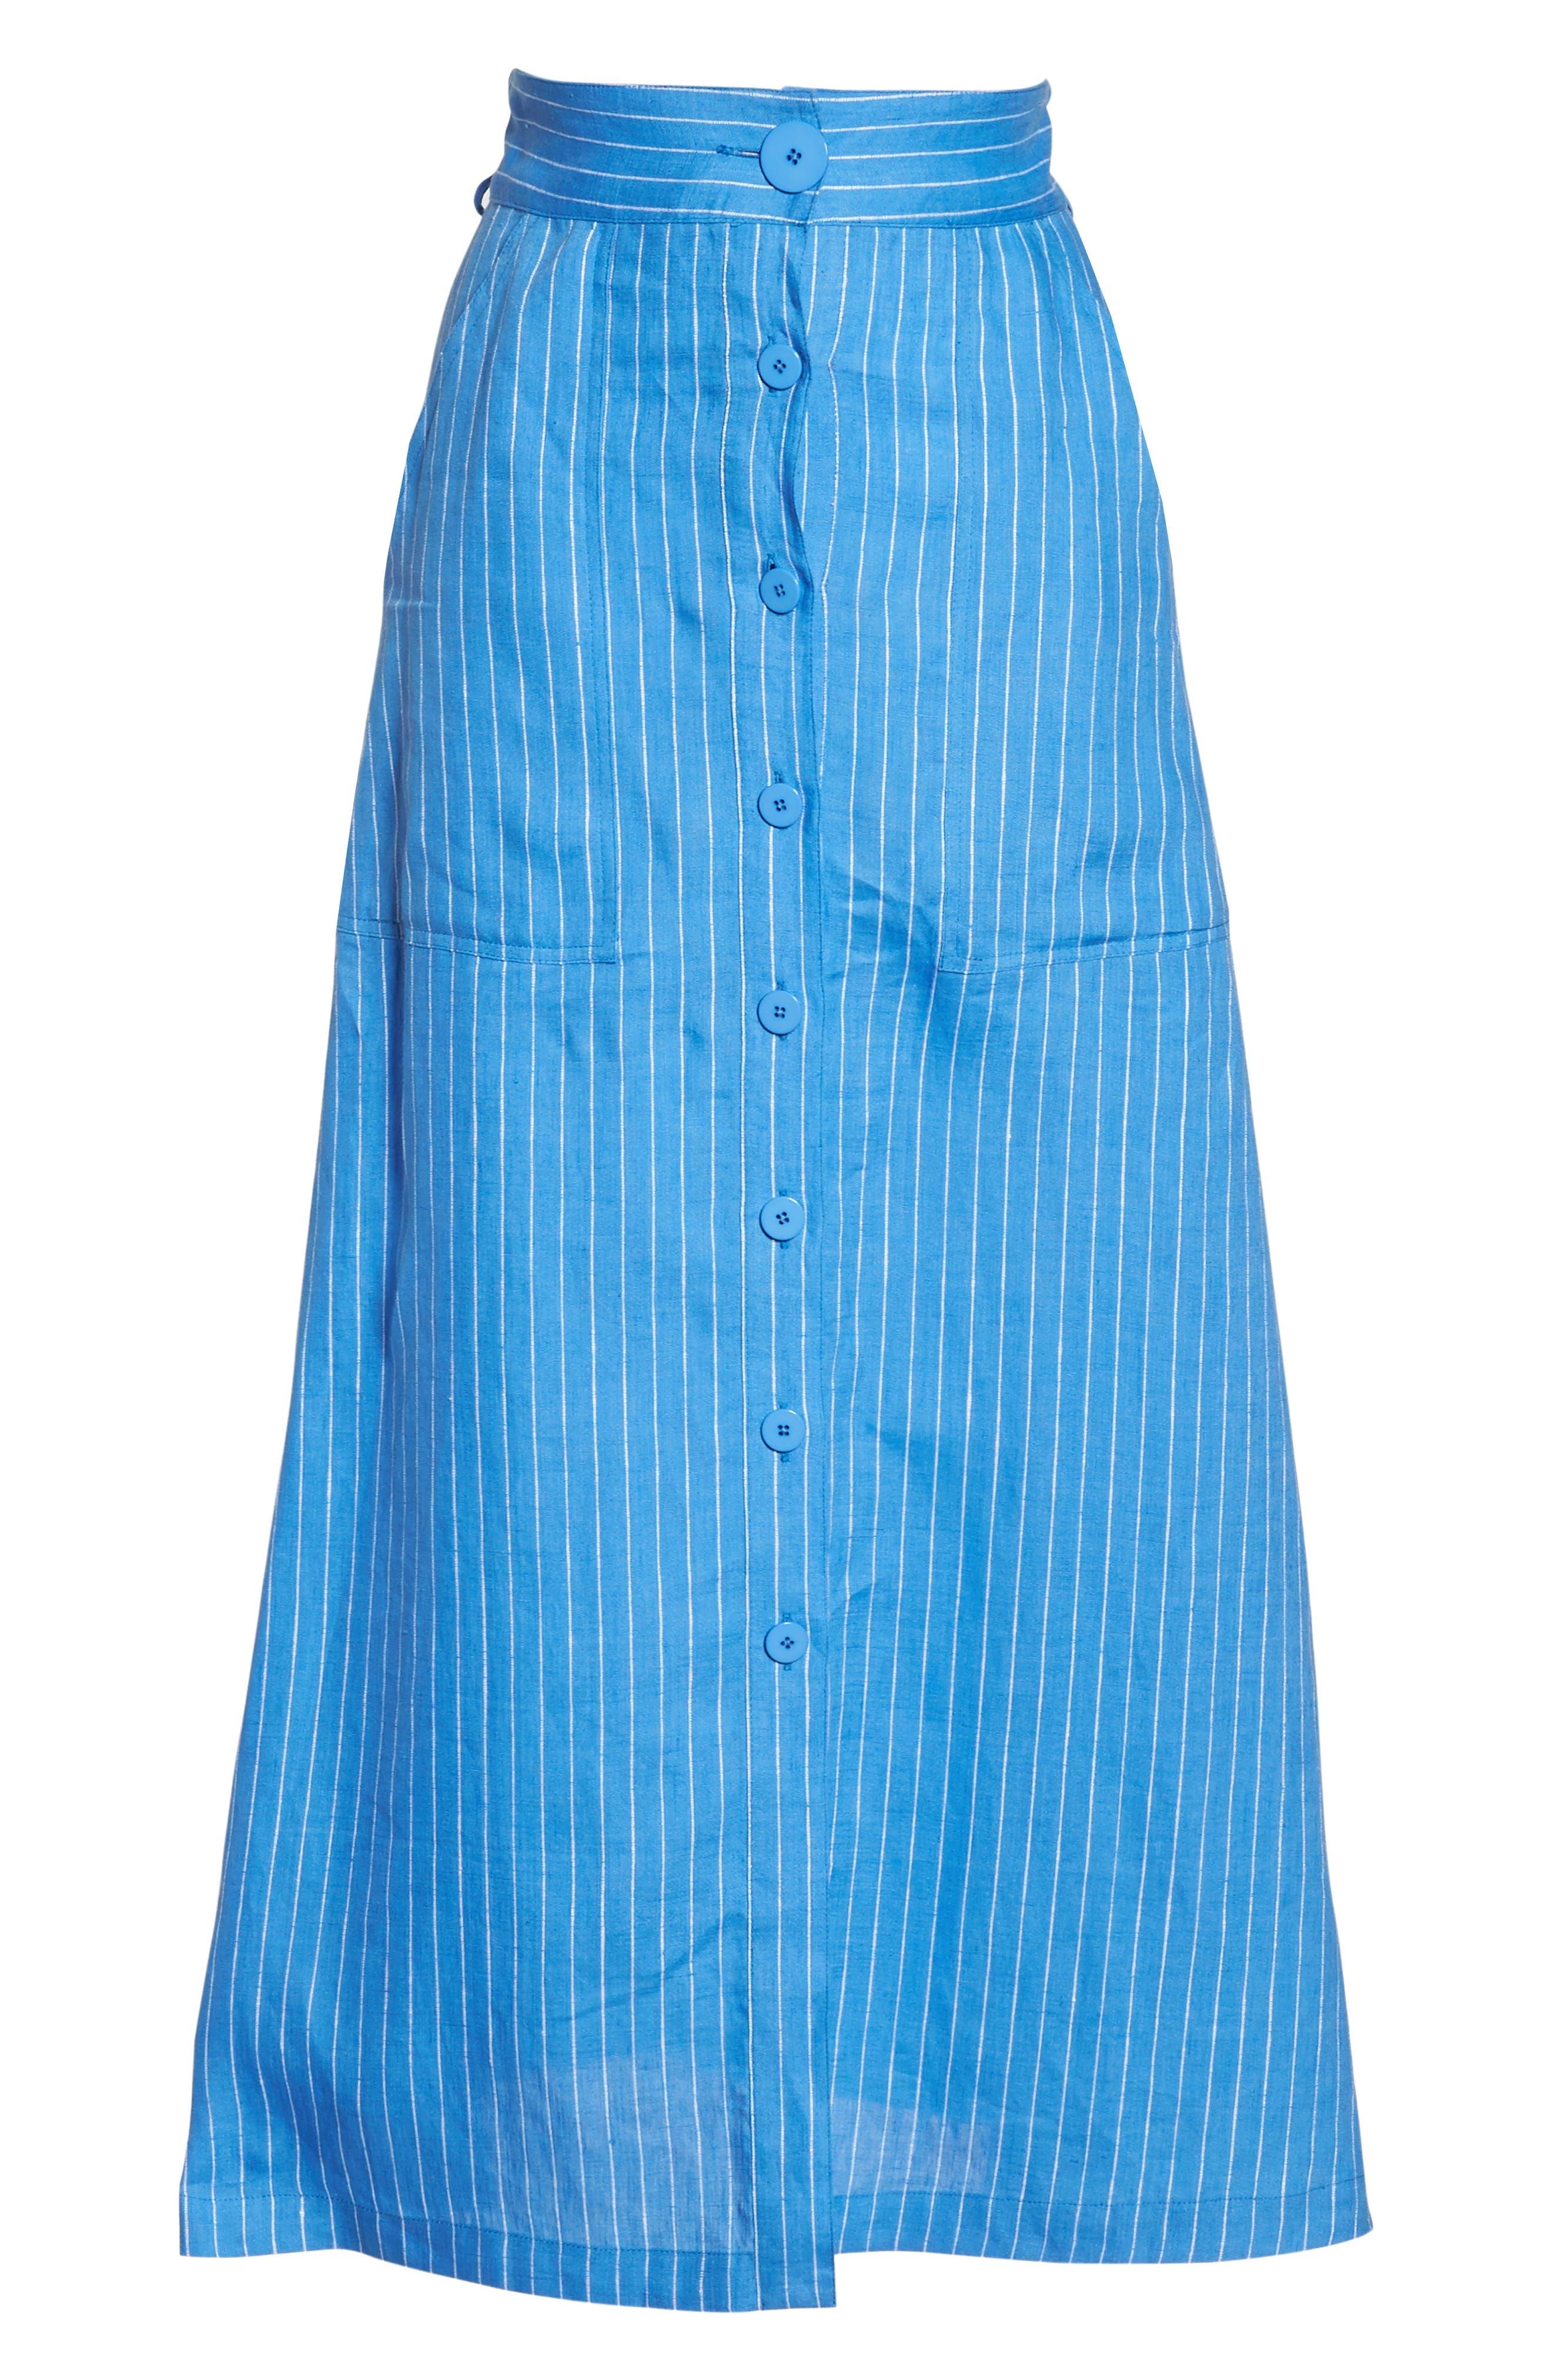 Cover-Up Skirt,                             Alternate thumbnail 6, color,                             Hydrangea/ Ivory